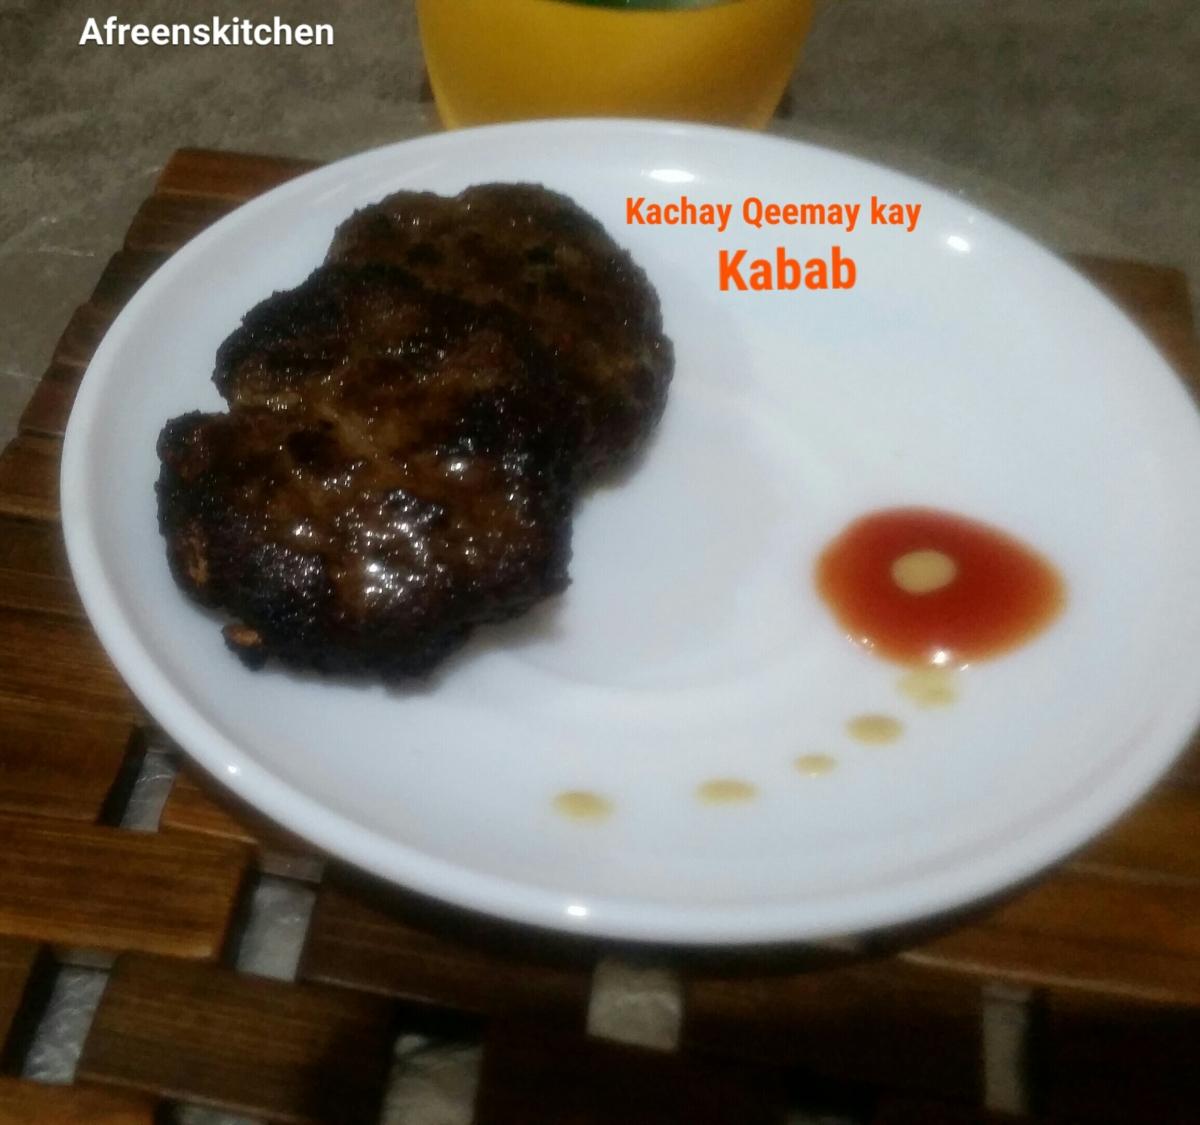 Kachay qeemay k Kabab